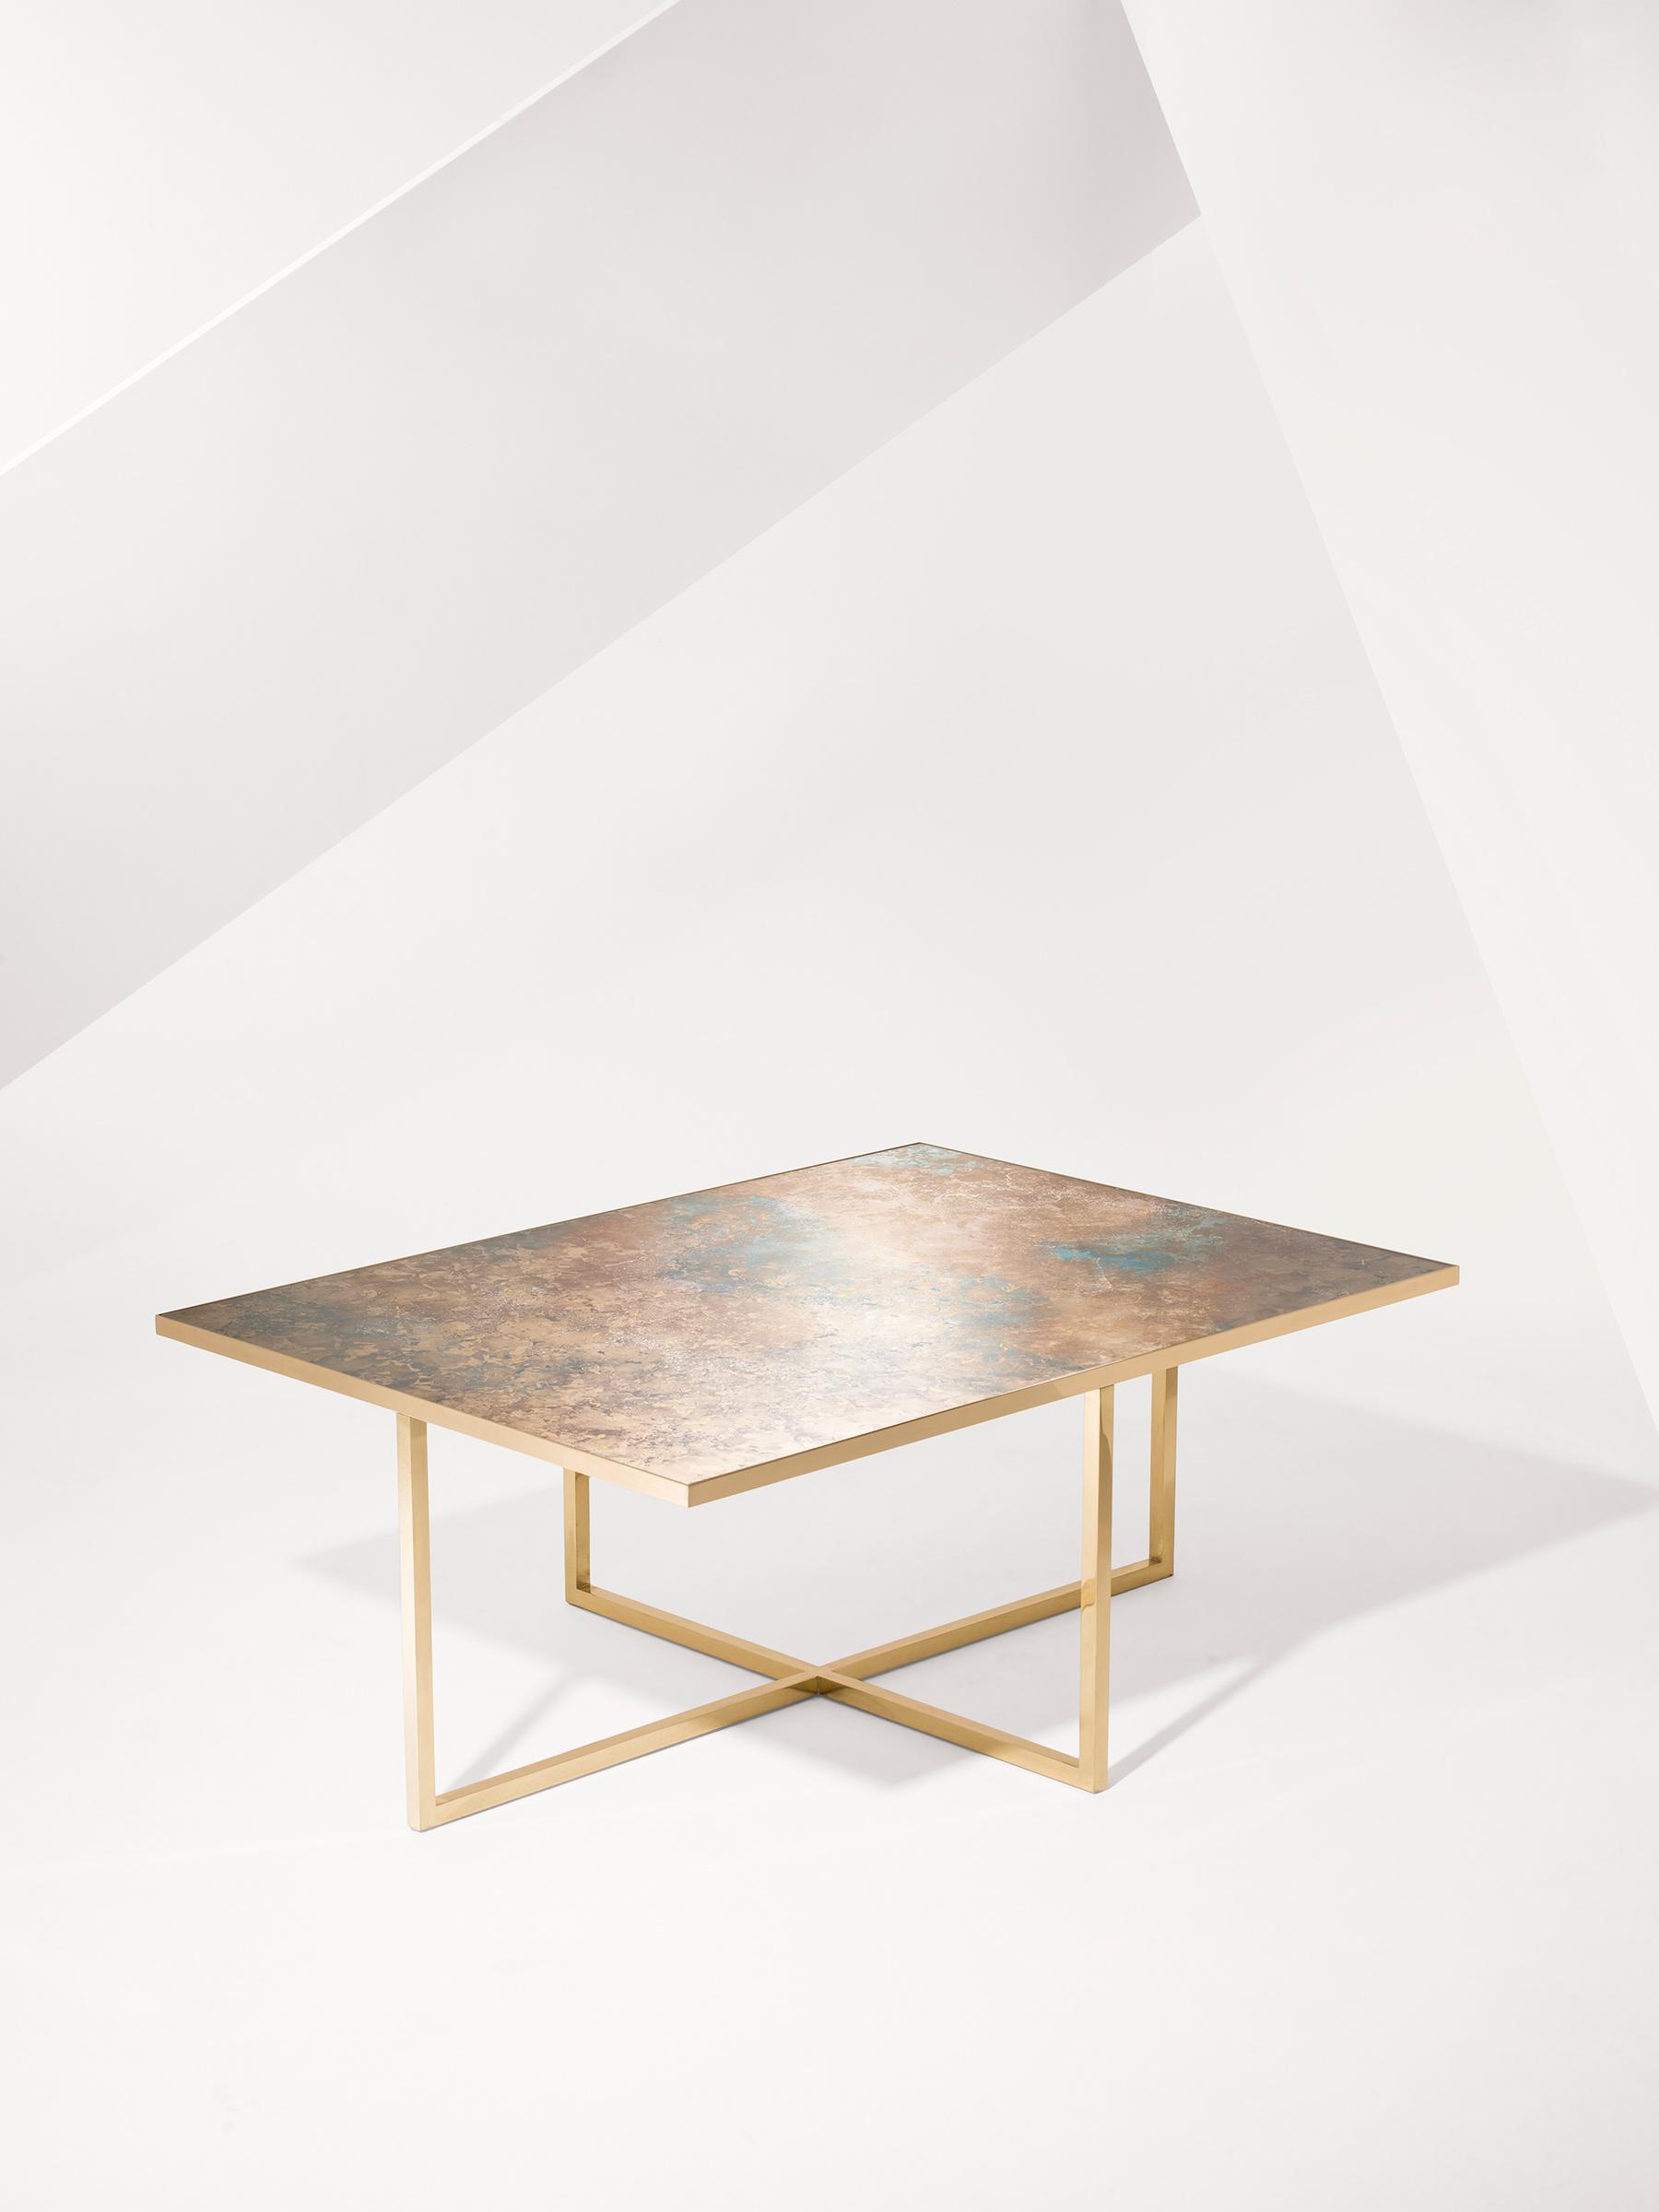 steppe-table-dance-alight-polished-studio-peascod.jpg